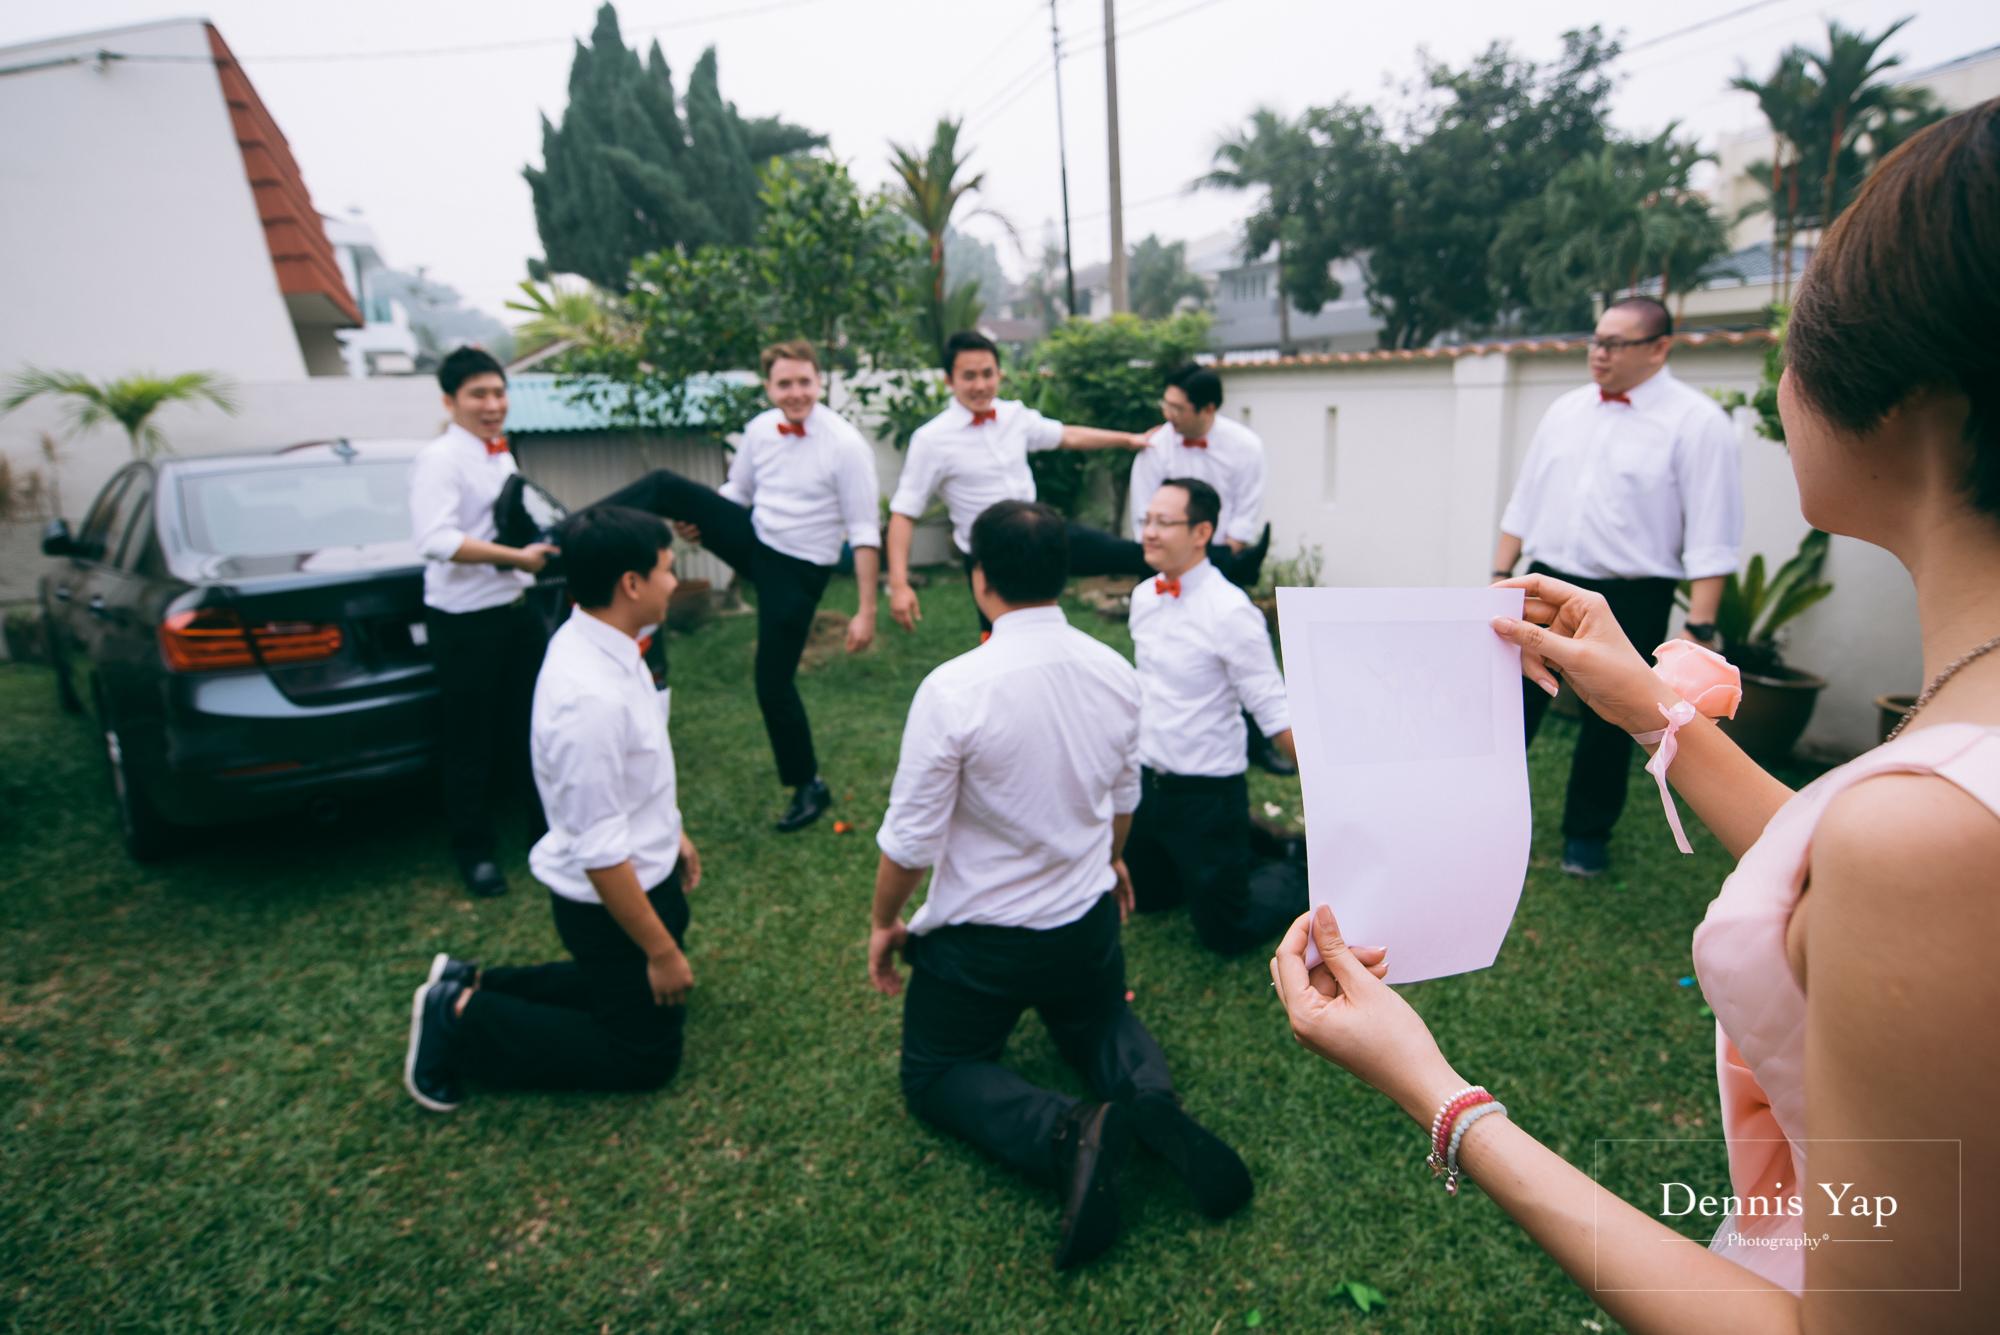 alex shir ley wedding day gate crash subang jaya usj dennis yap photography moments-7.jpg